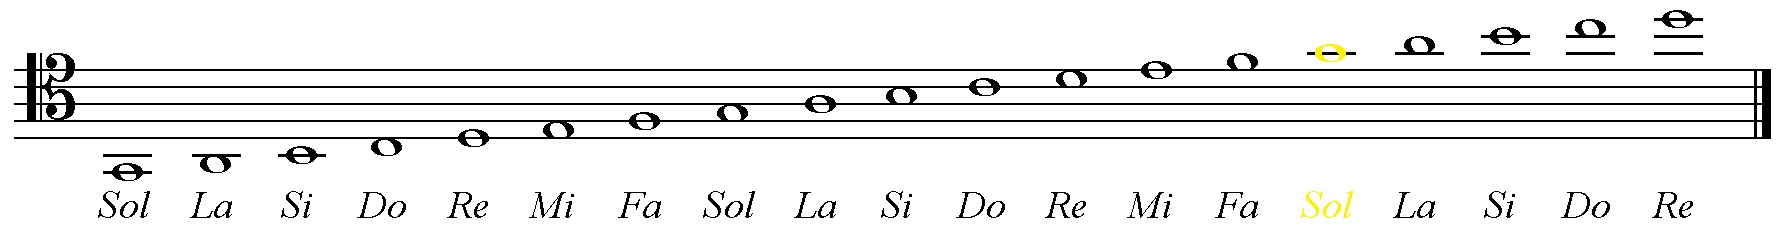 La Flauta En Posicion De Manos